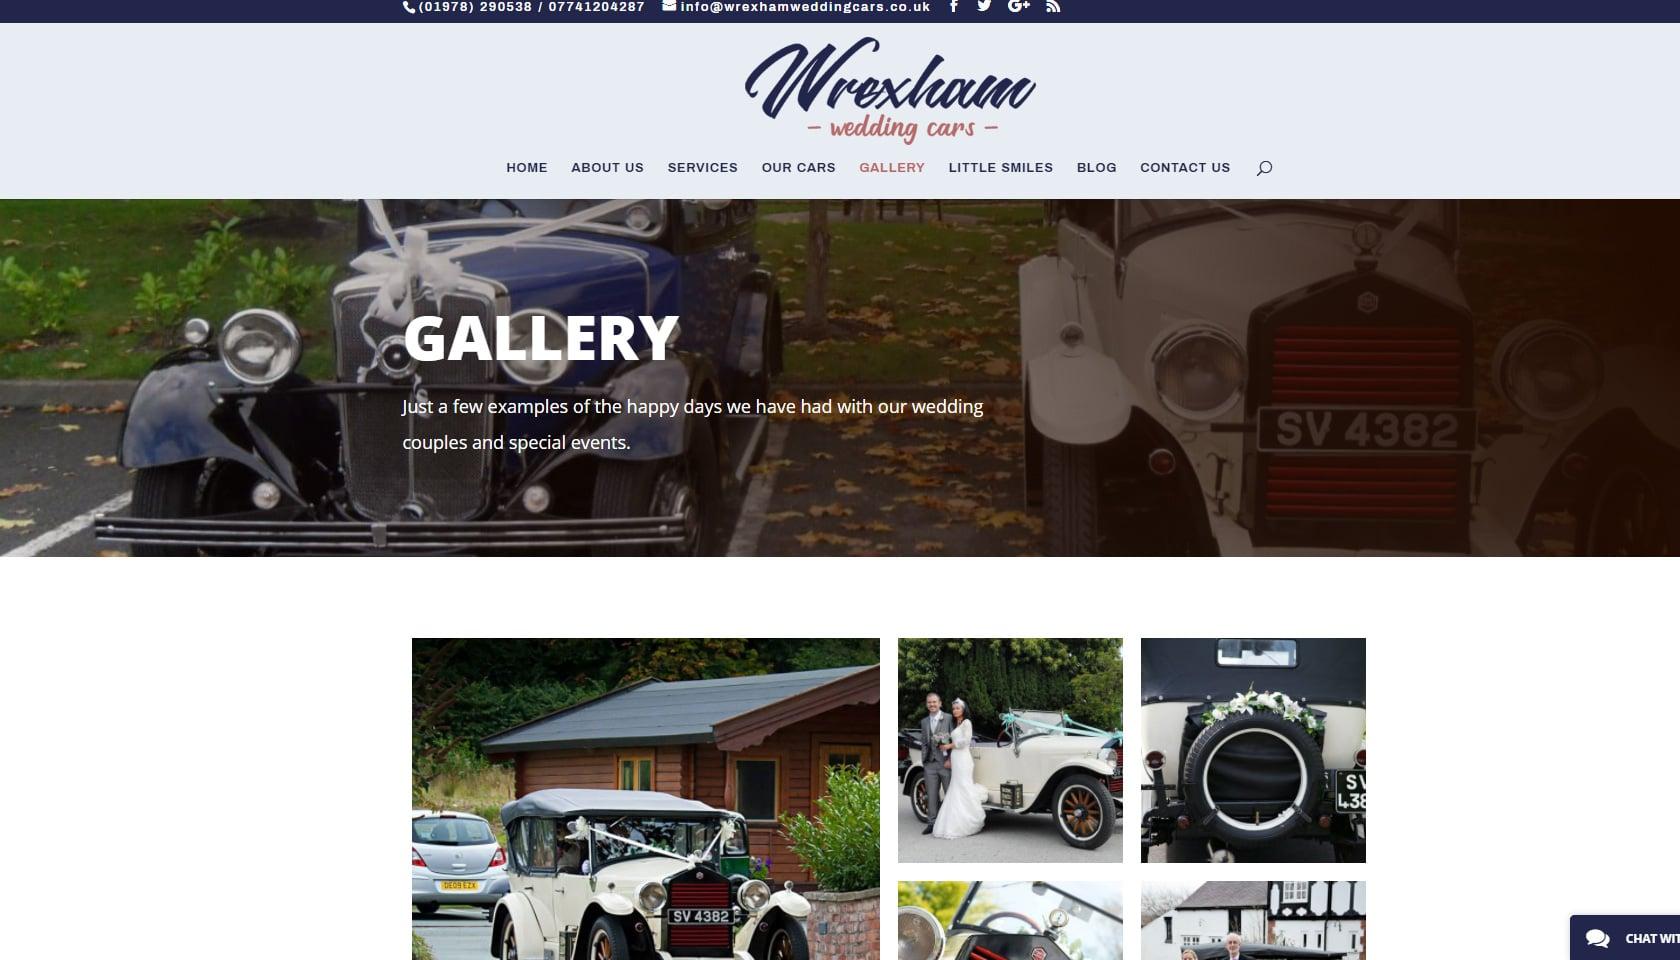 wrexham wedding cars gallery page